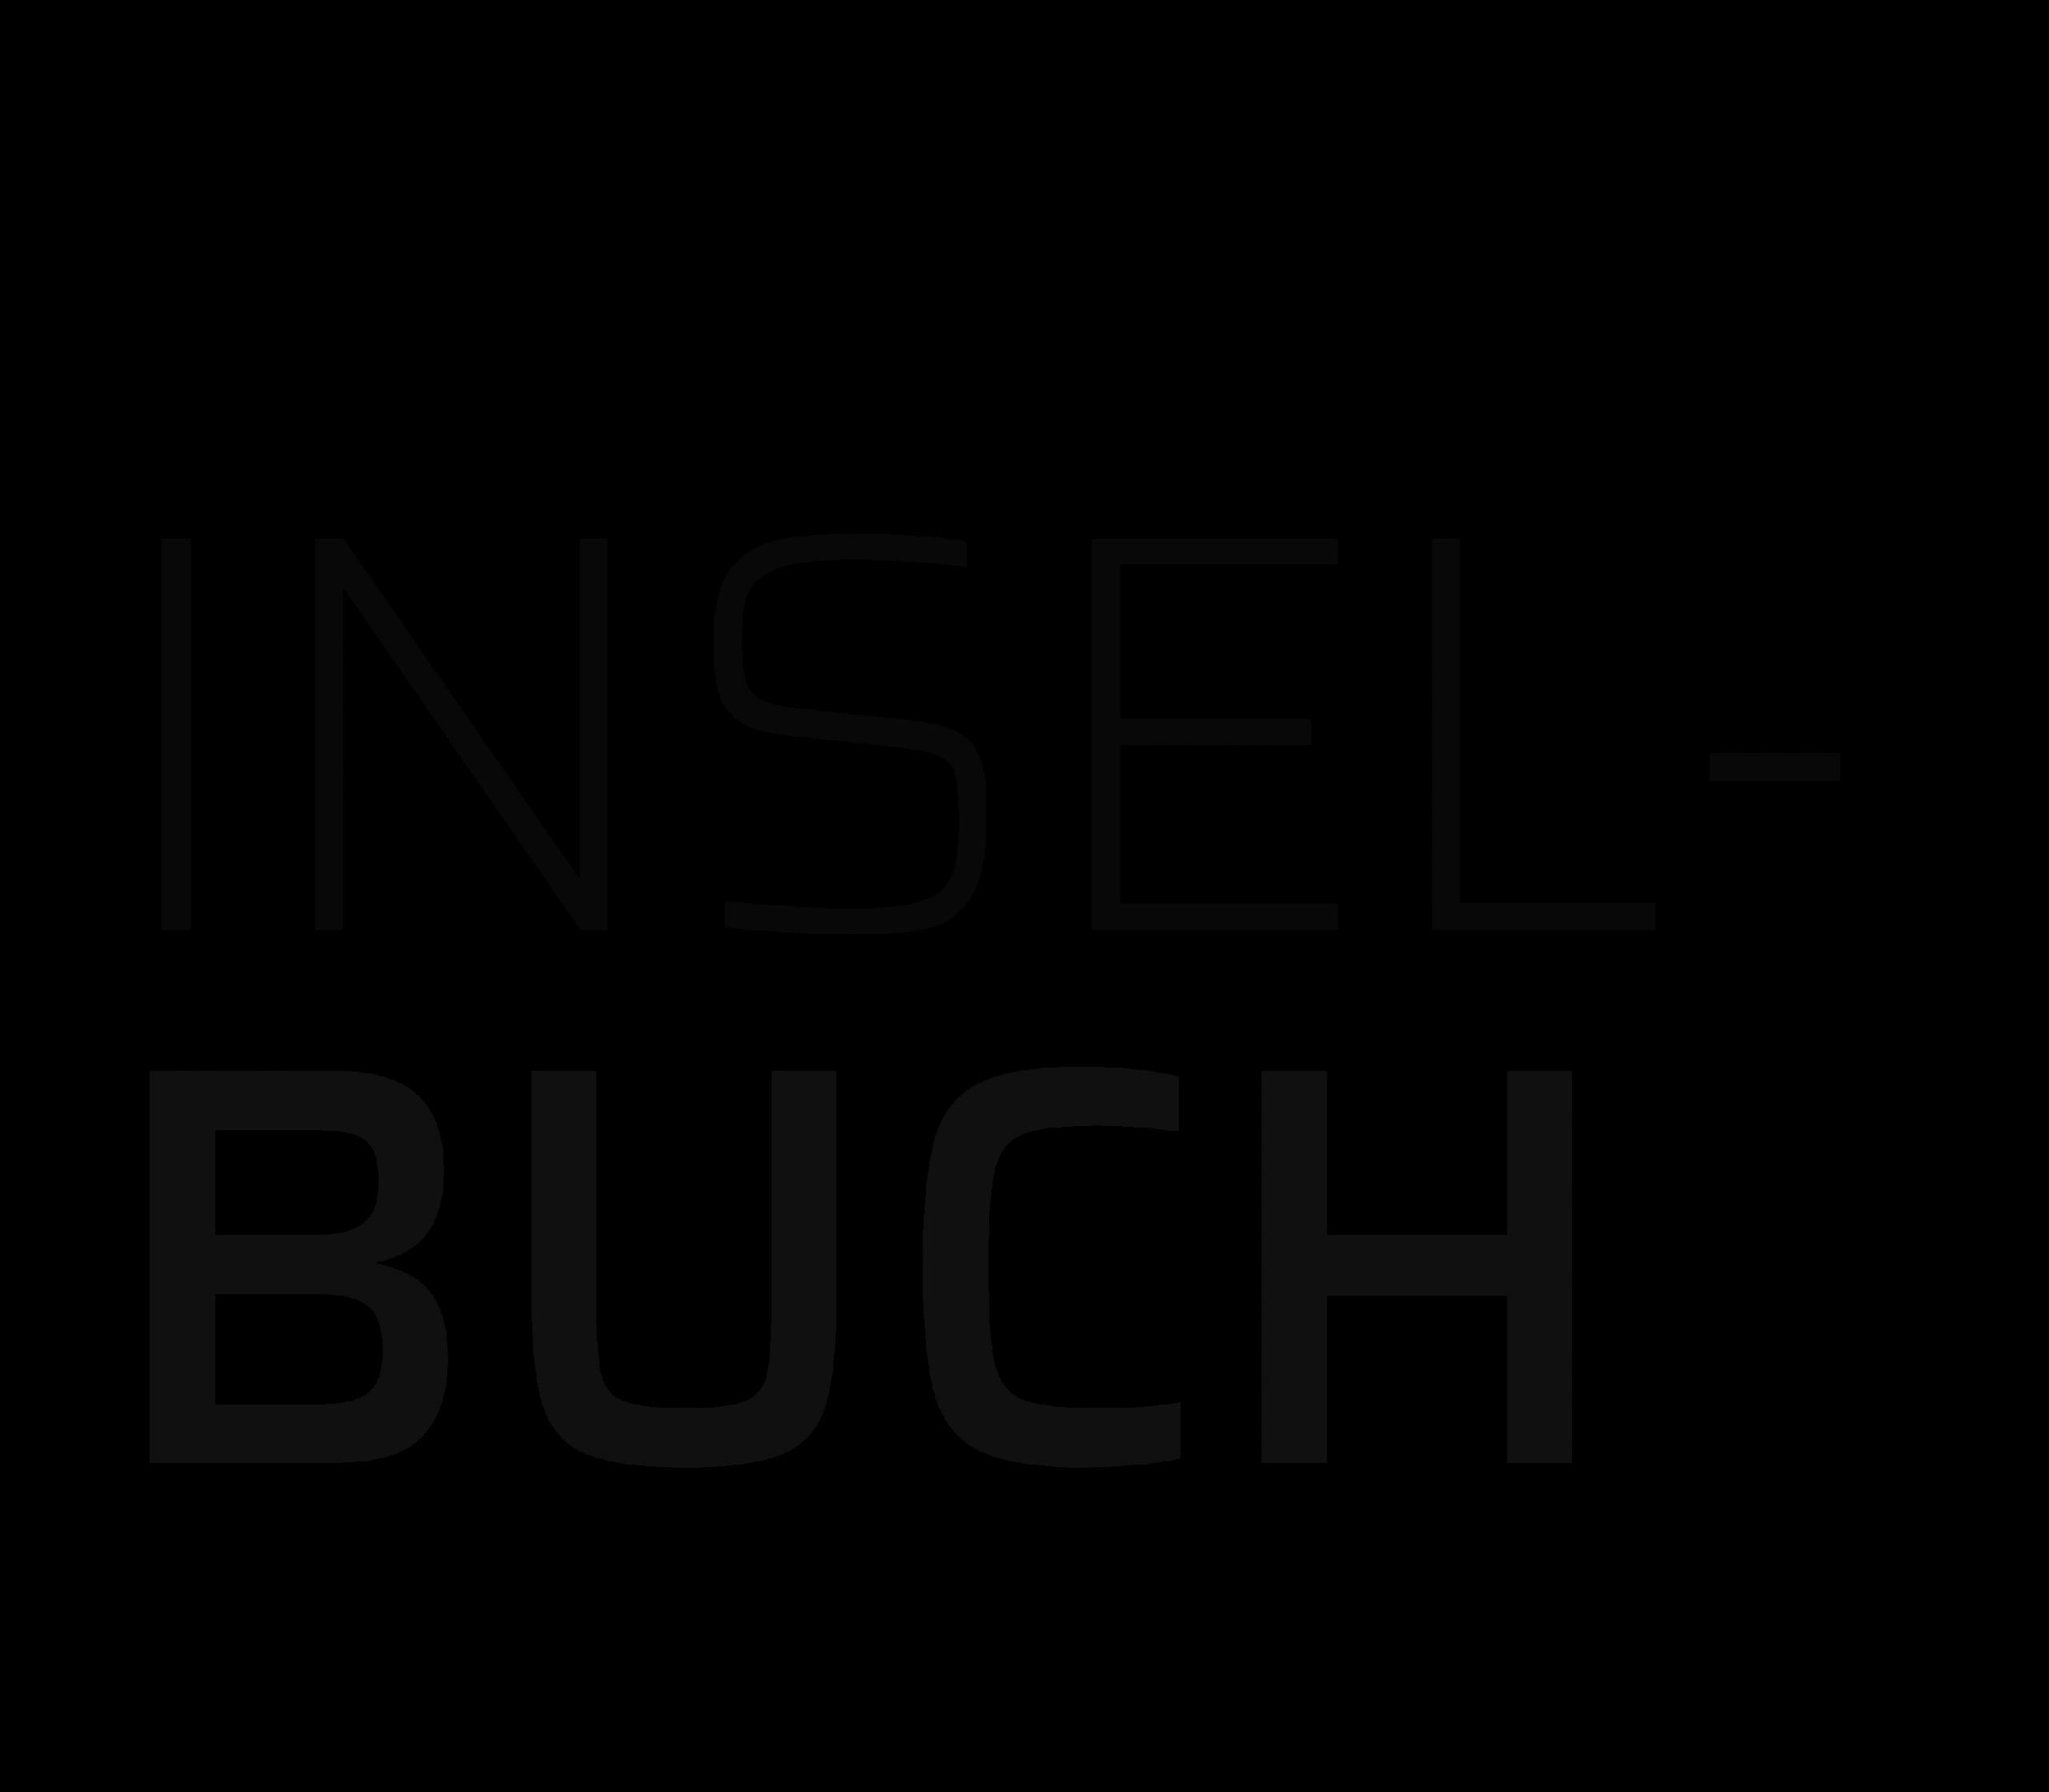 Inselbuch